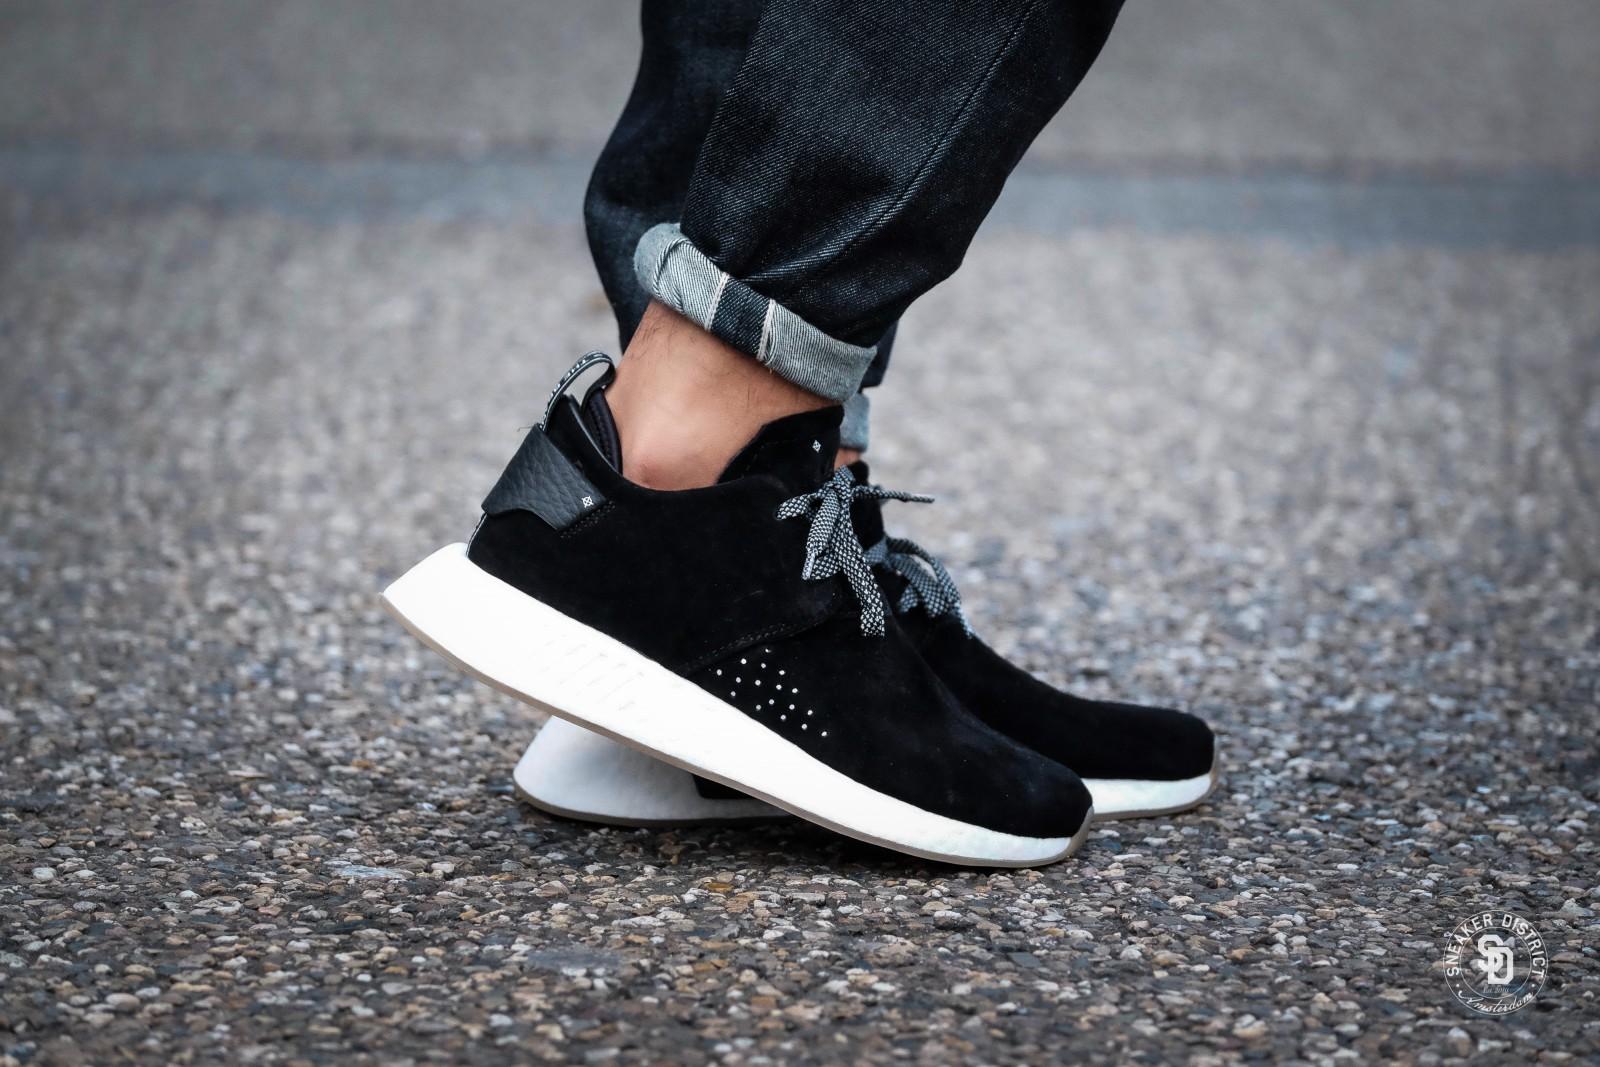 Adidas NMD C2 Core Black Gum - BY3011